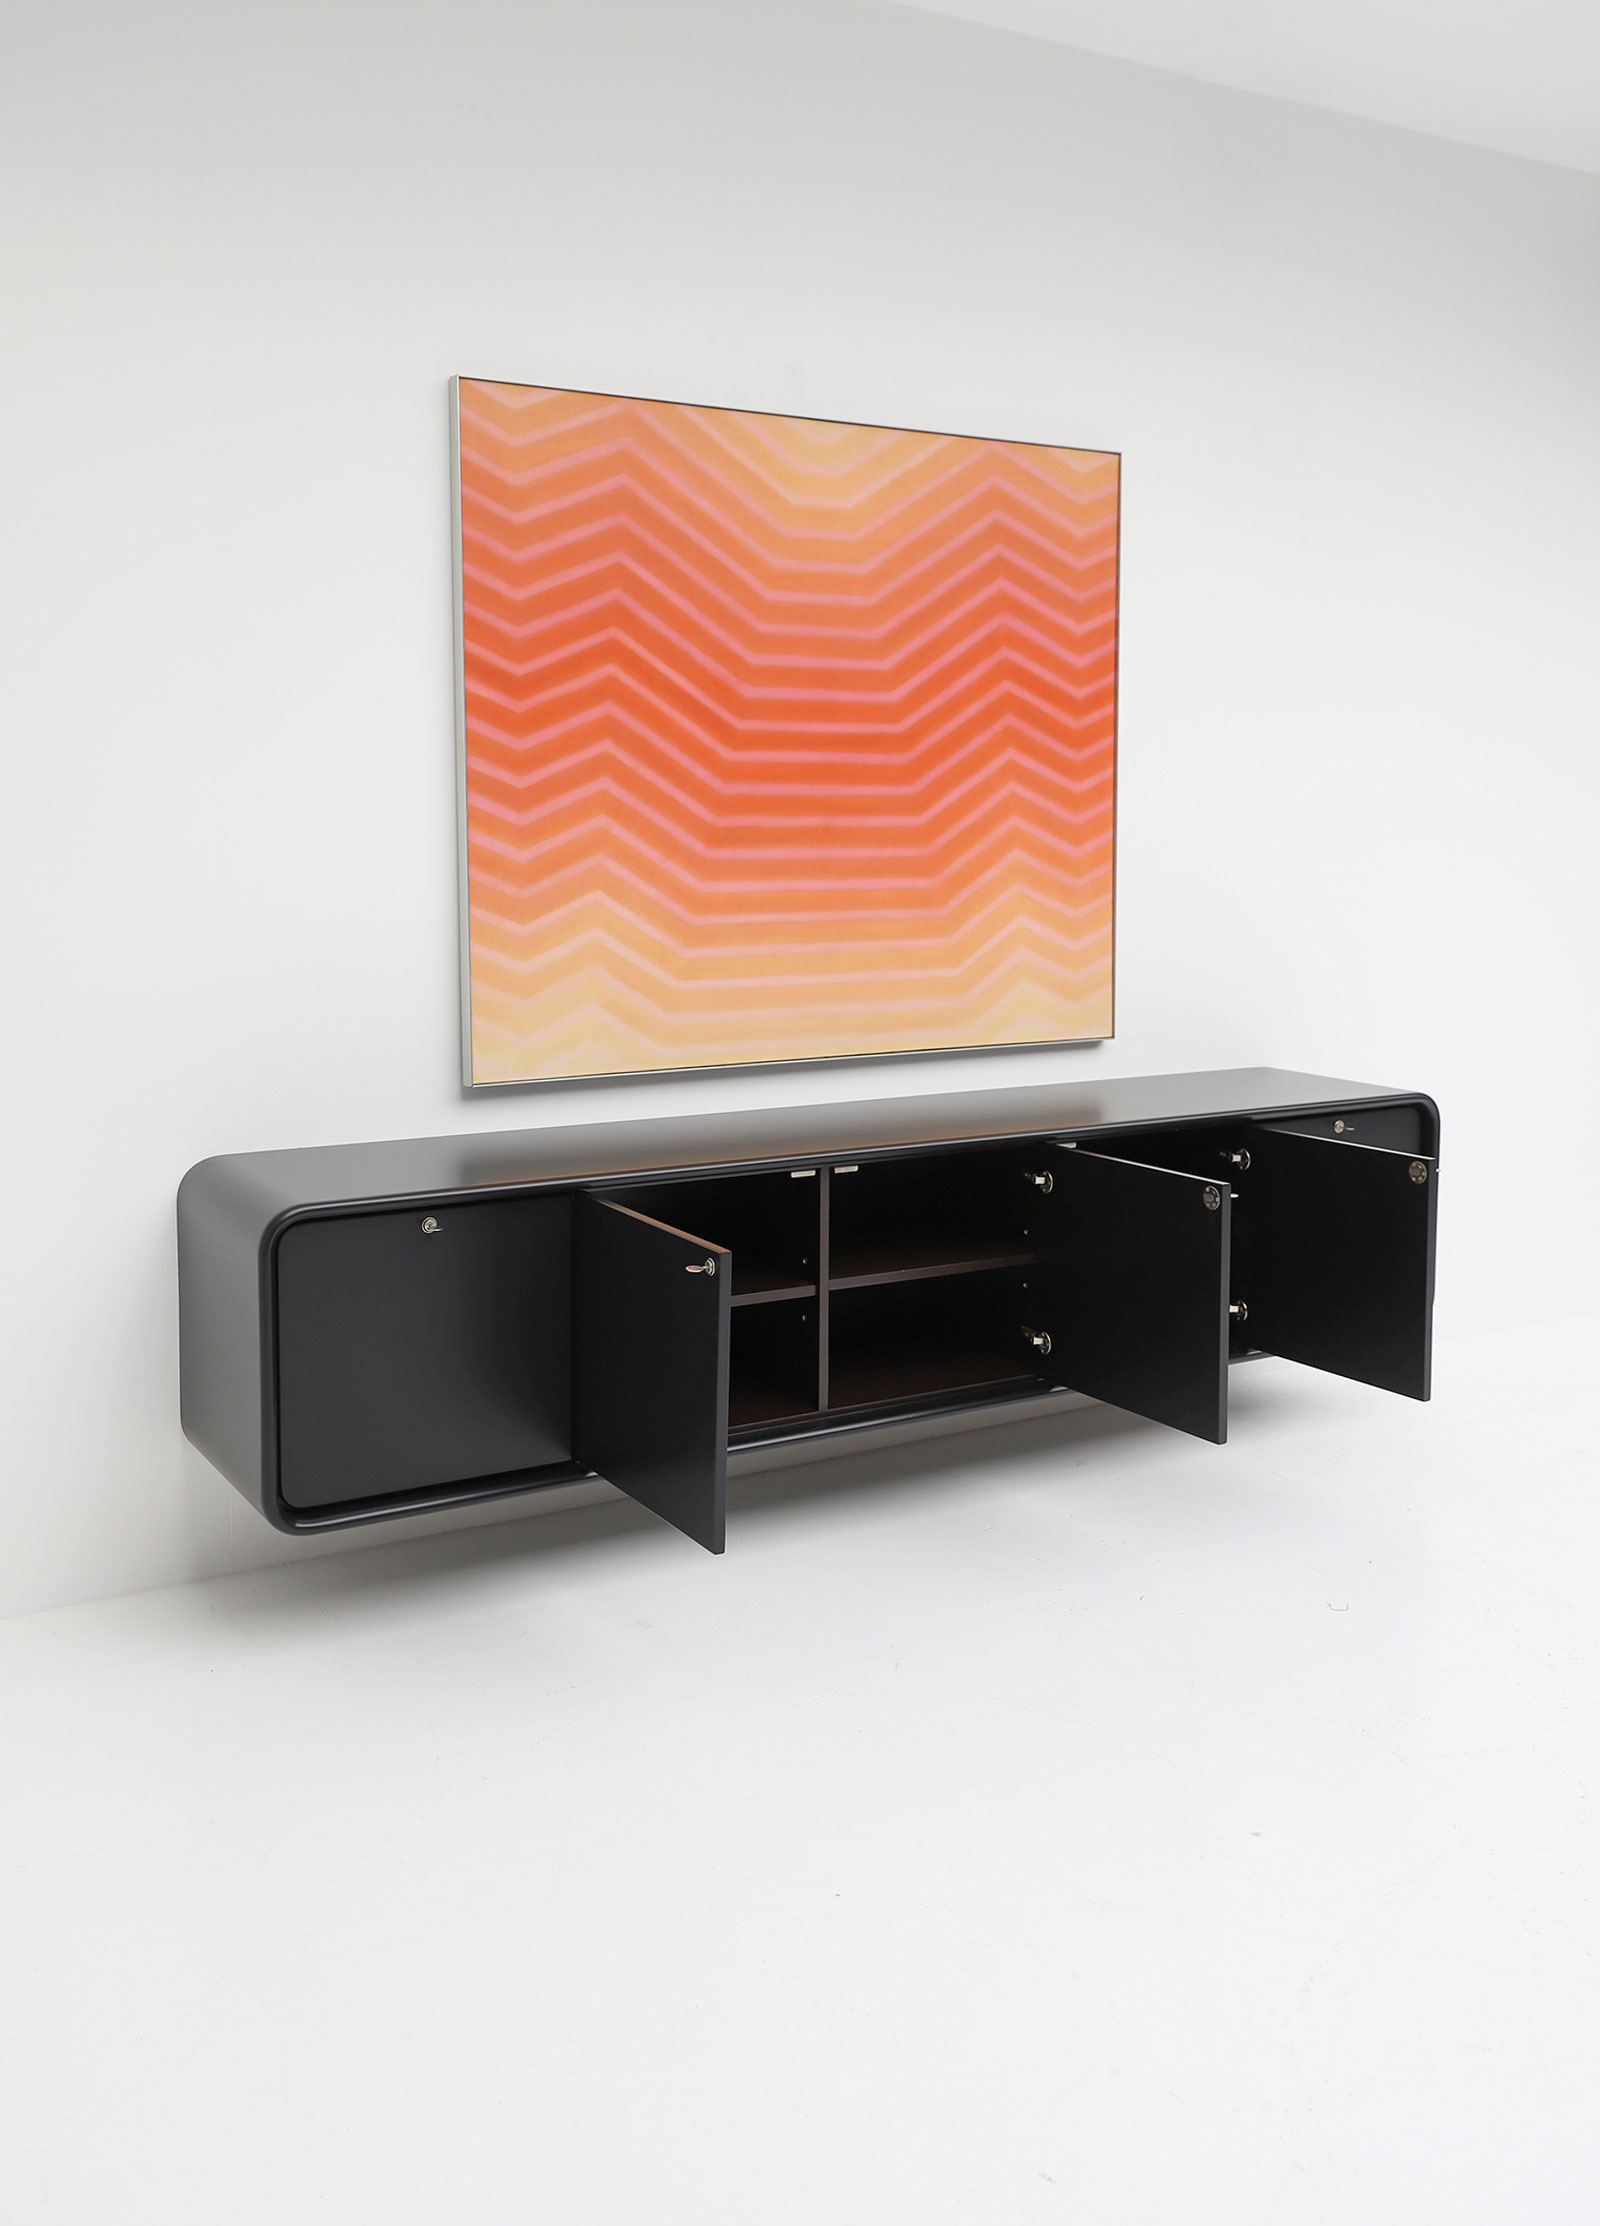 Black Minimalistic  Space Age Sideboard by Frank De Clercq